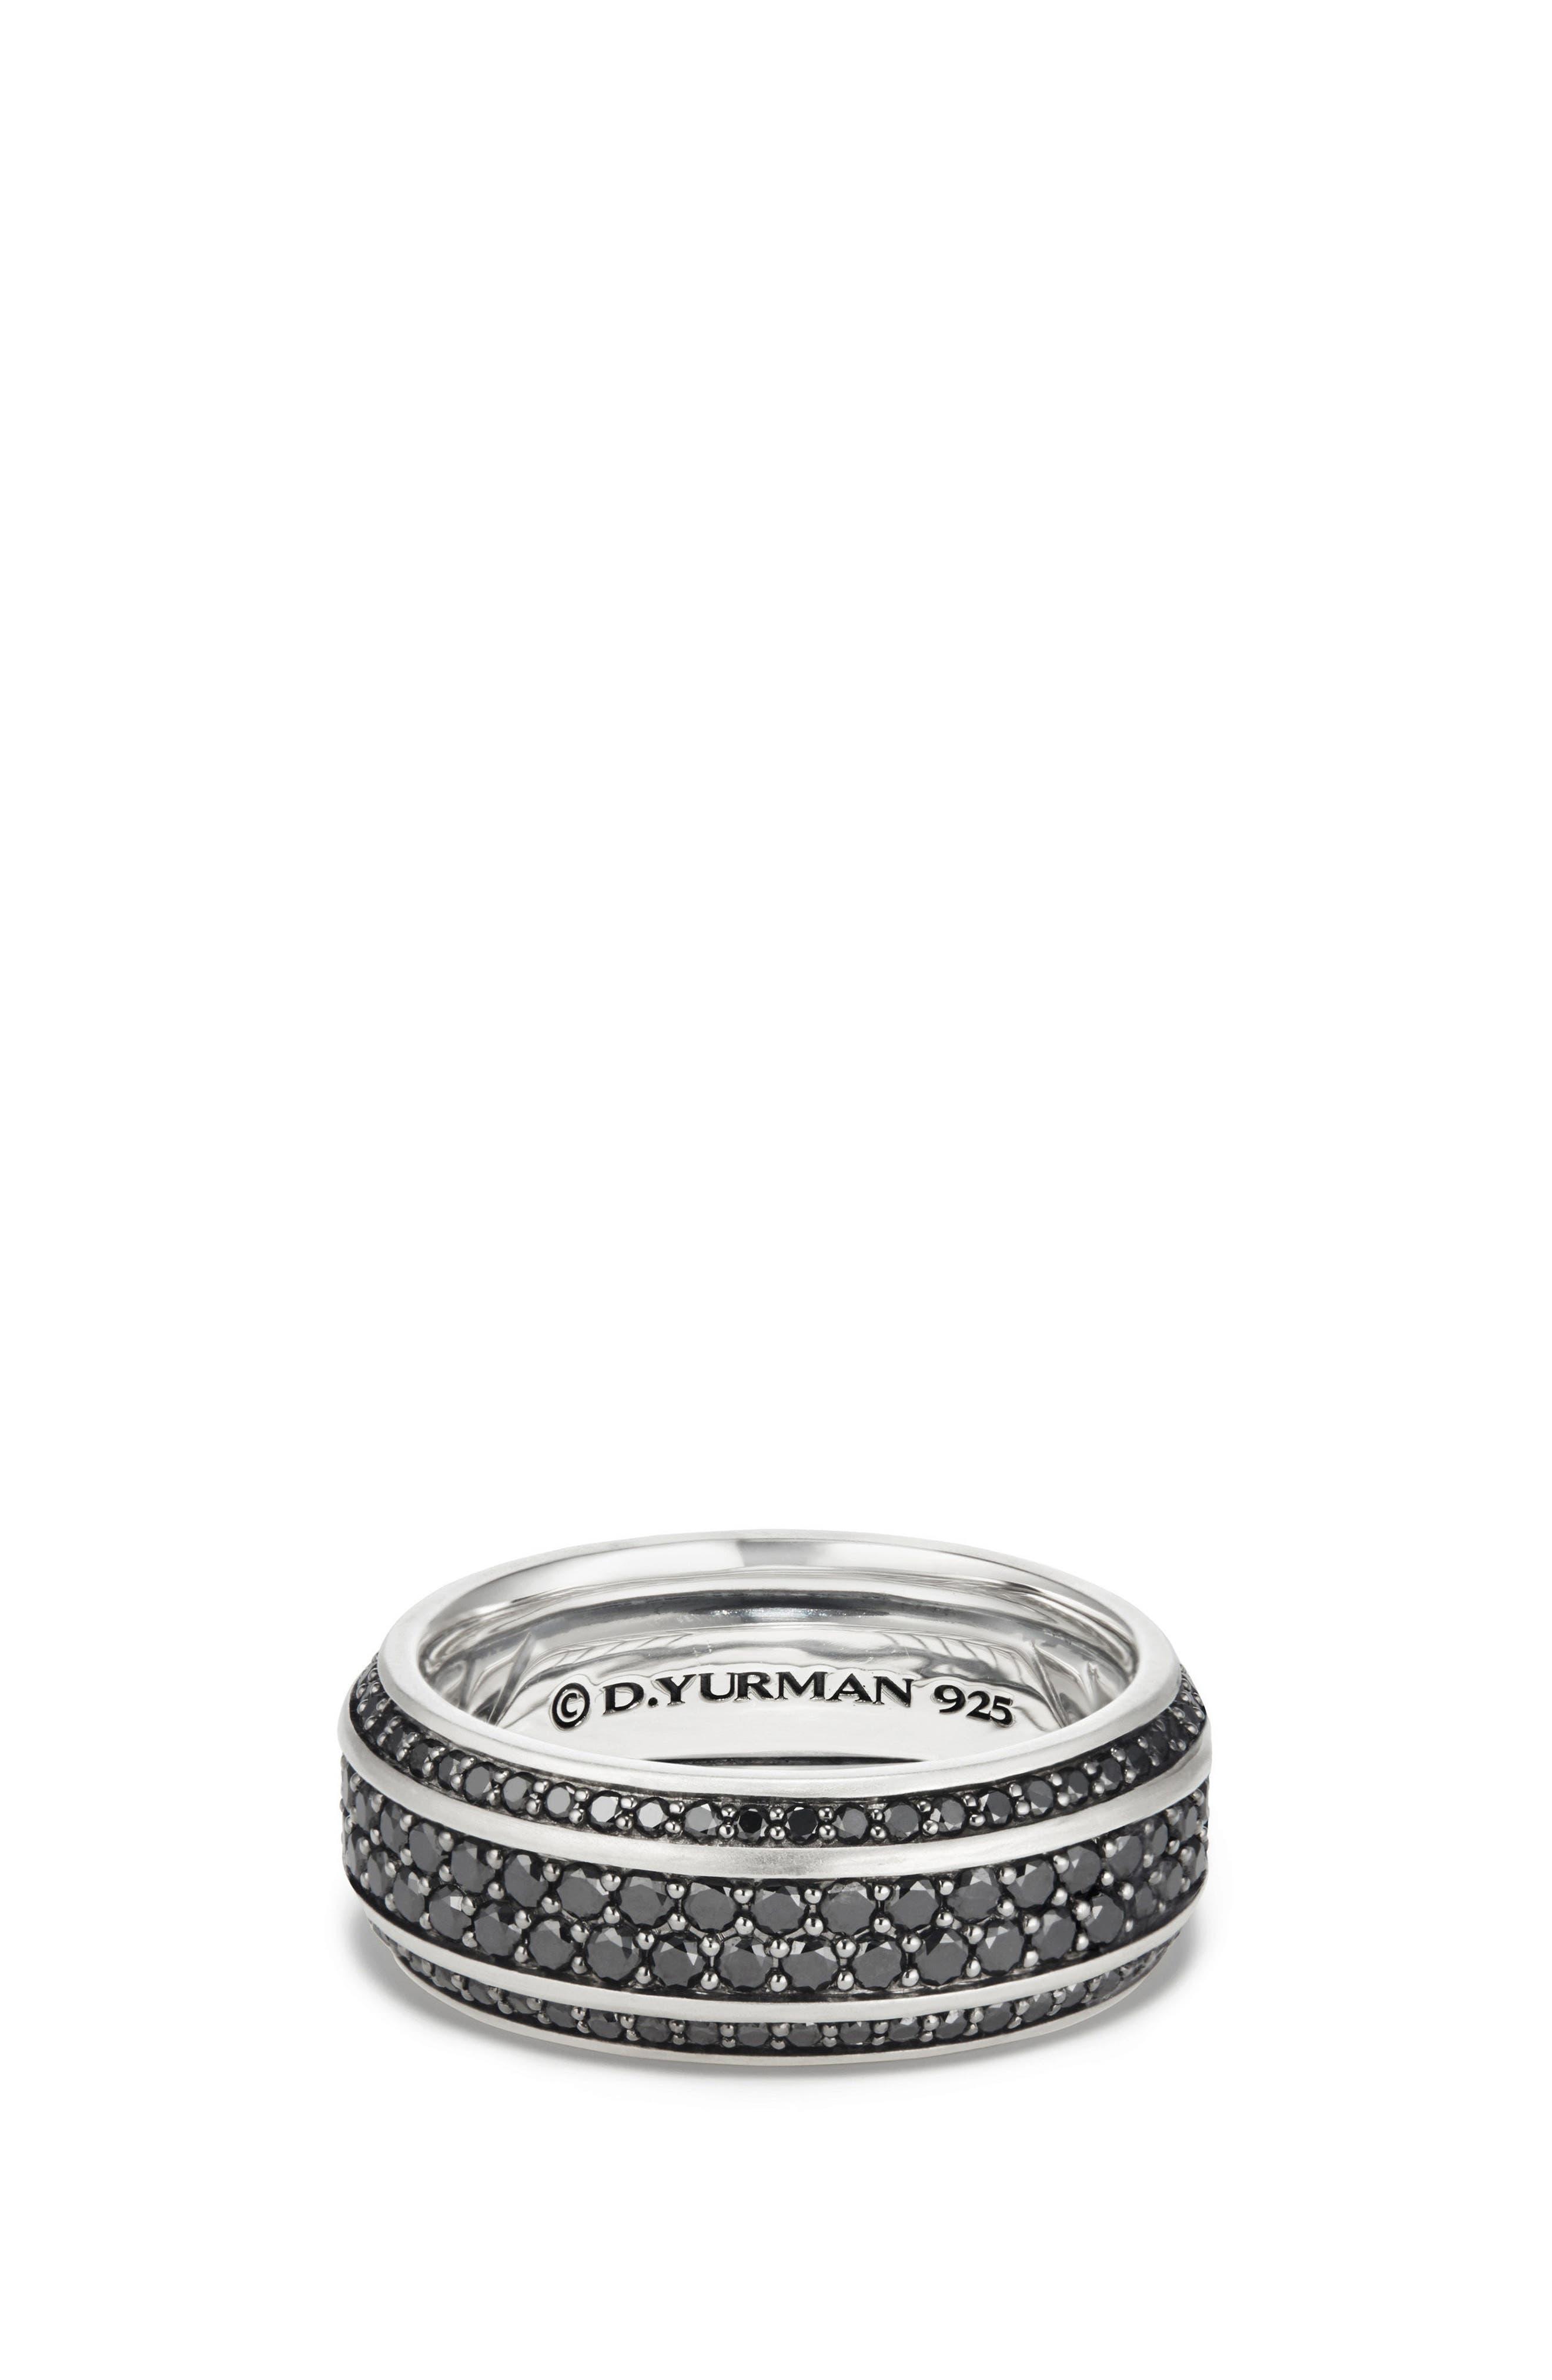 Streamline Beveled Edge Band Ring,                             Main thumbnail 1, color,                             BLACK DIAMOND